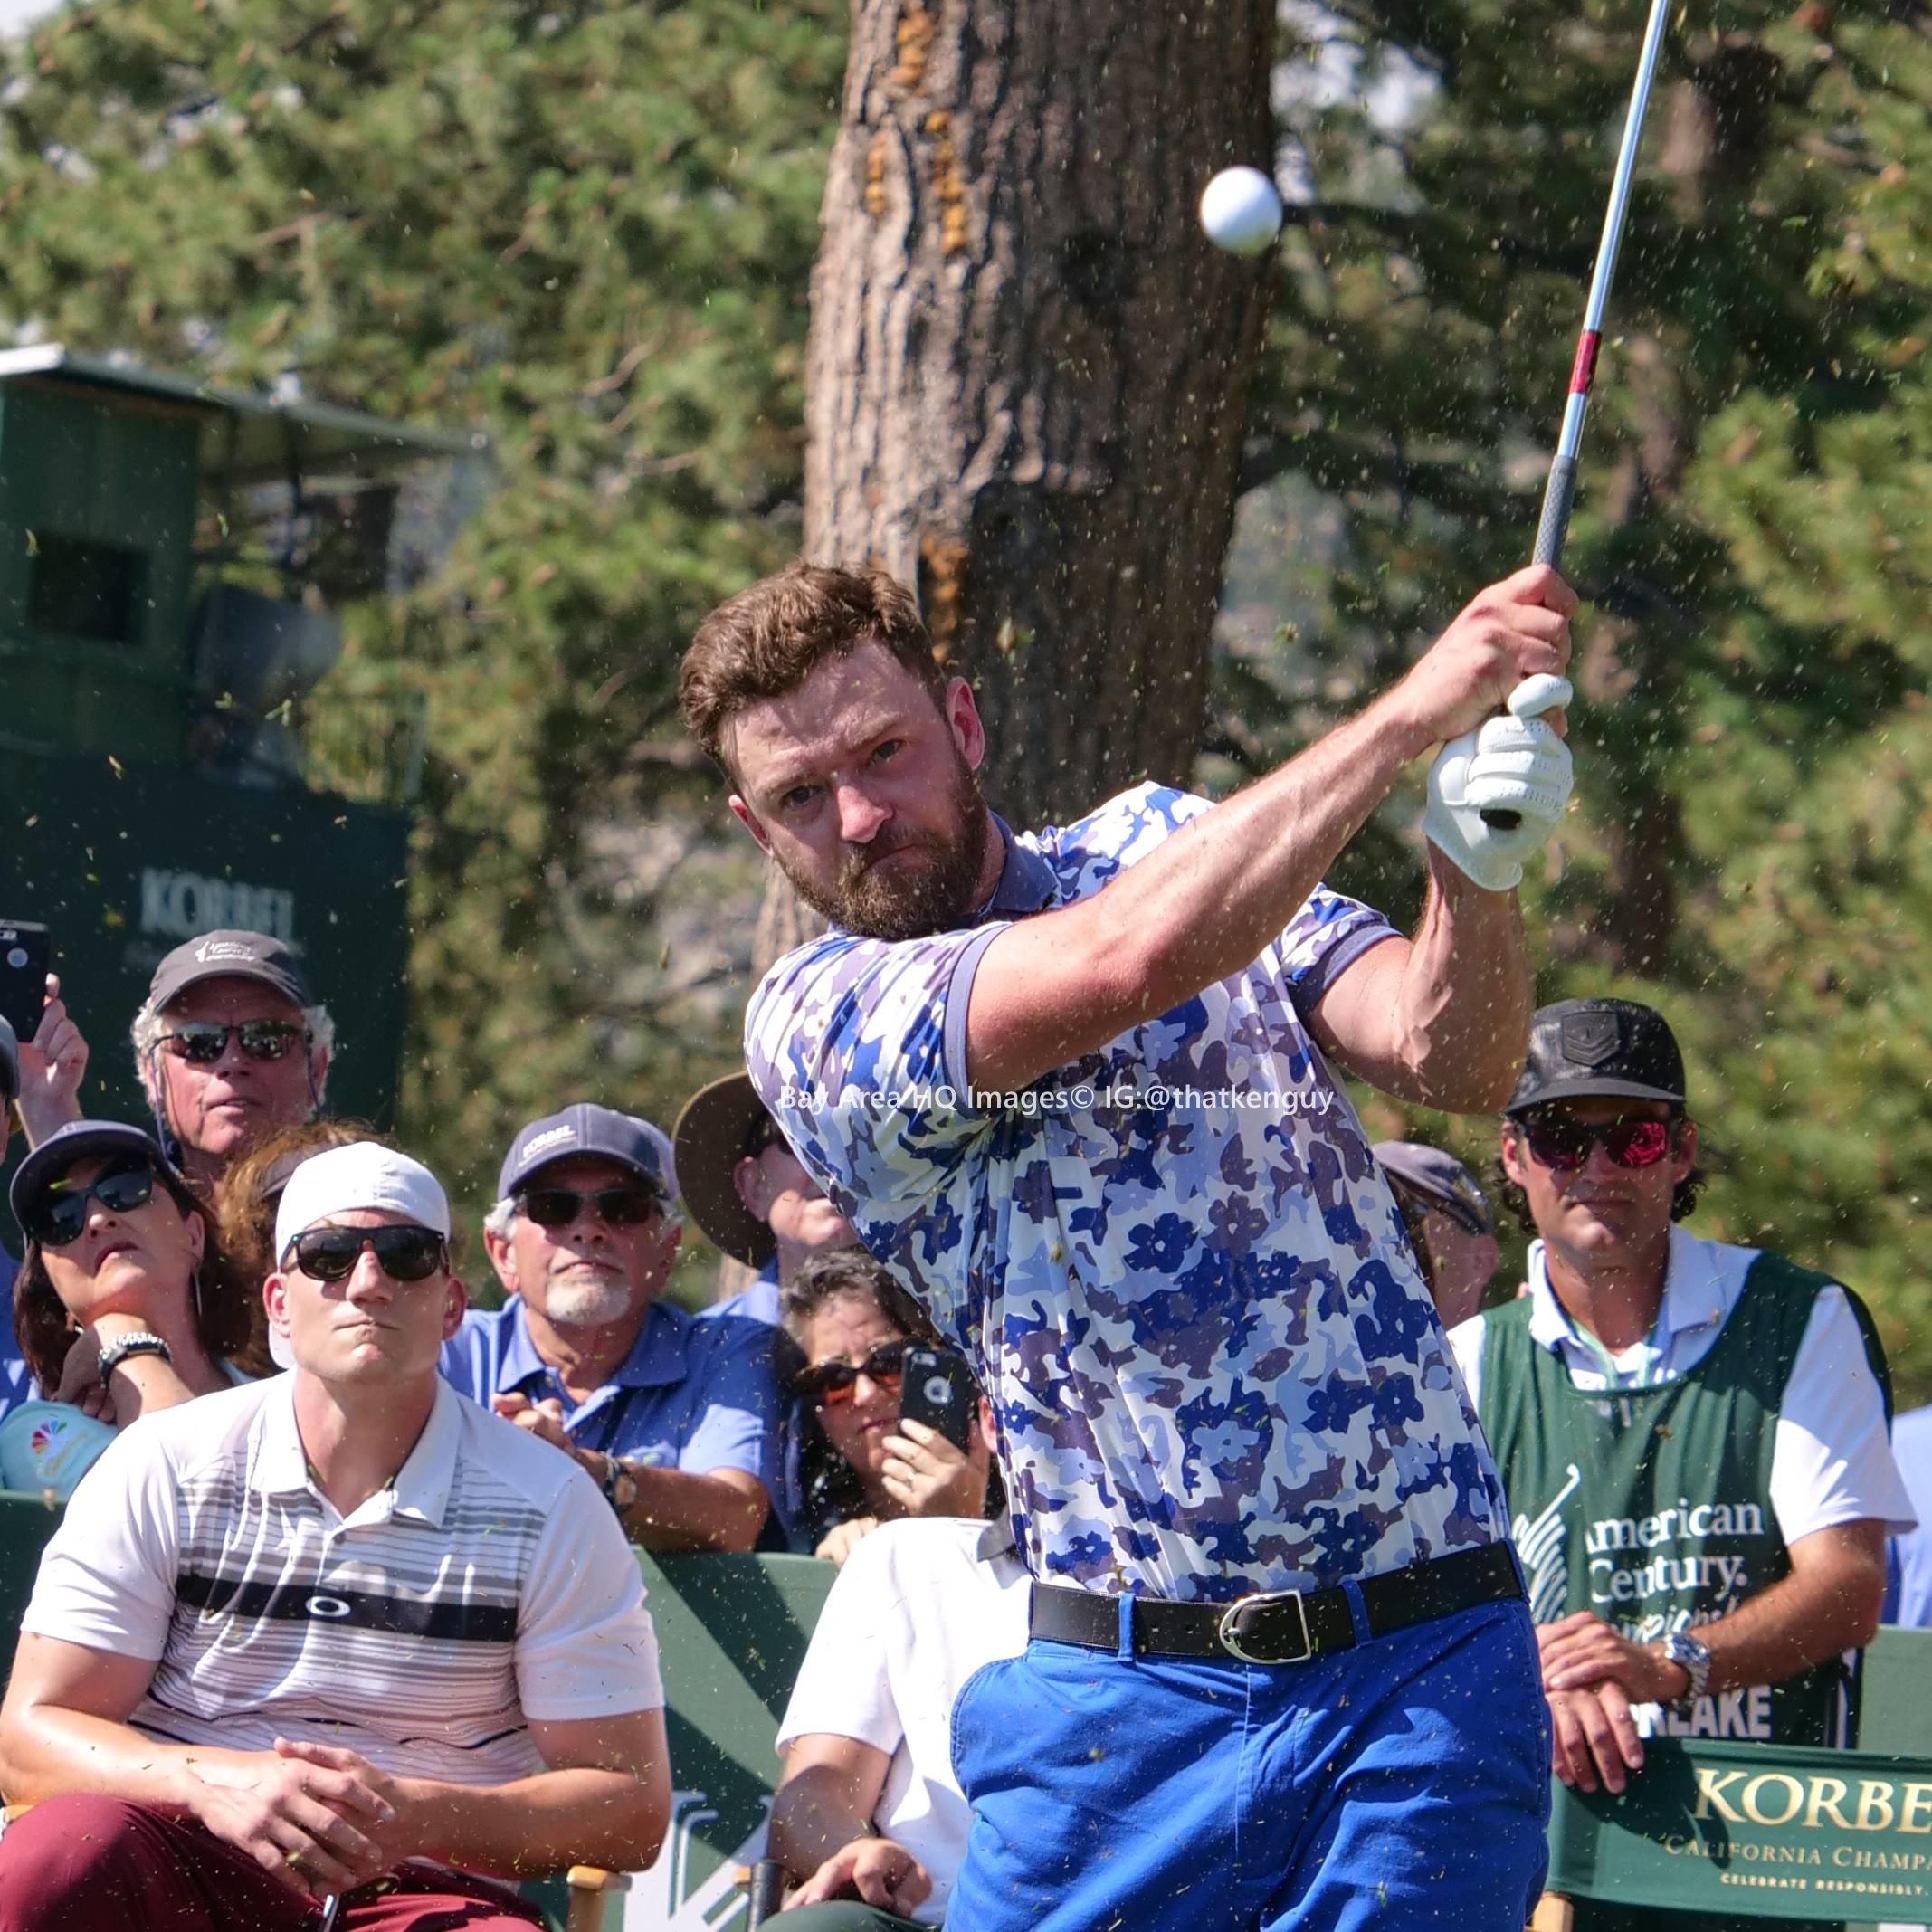 American Century Championship Photos 2017 Images - Justin Timberlake, Stephen Curry, Tony Romo, Aaron Rodggers, Charles Barkley899